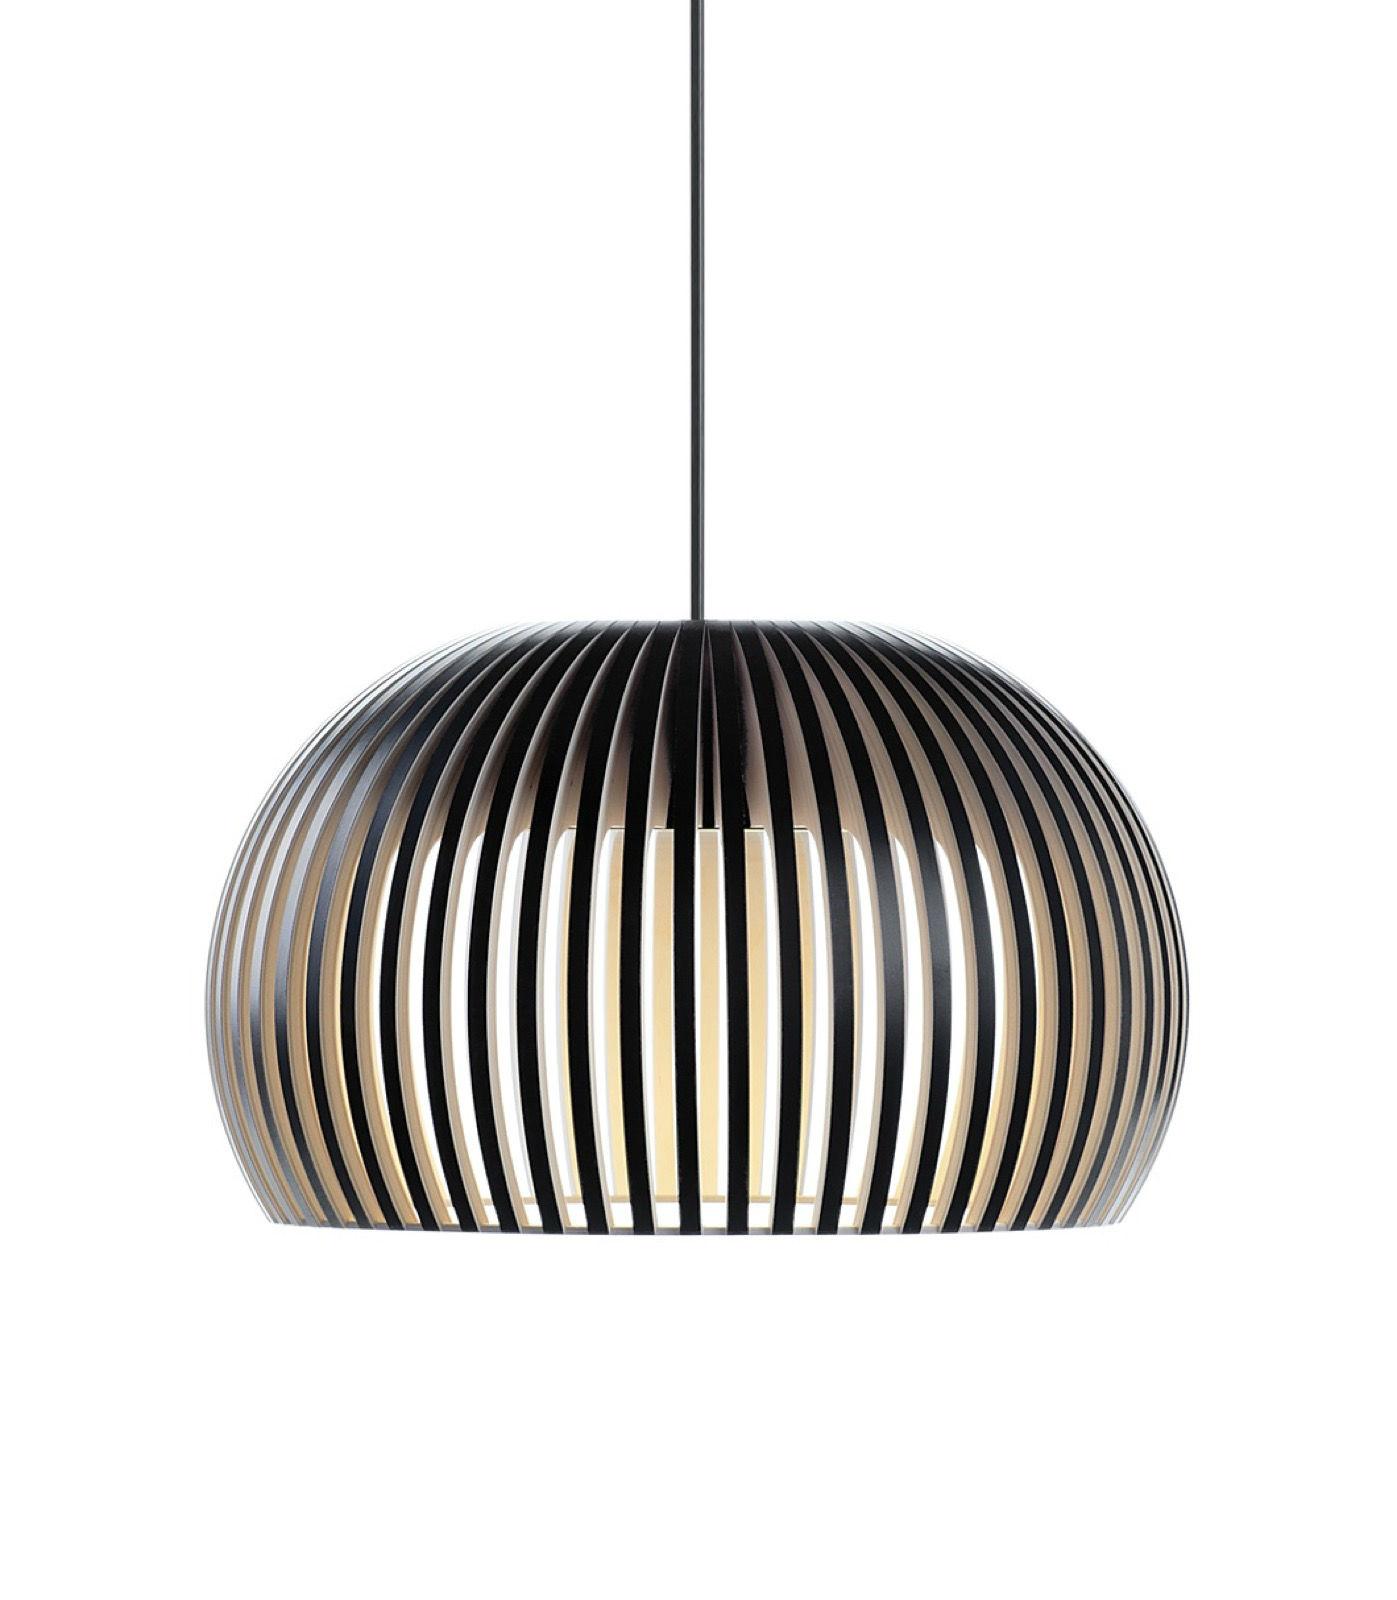 Secto Design Atto 5000 hanglamp   Matser Wageningen